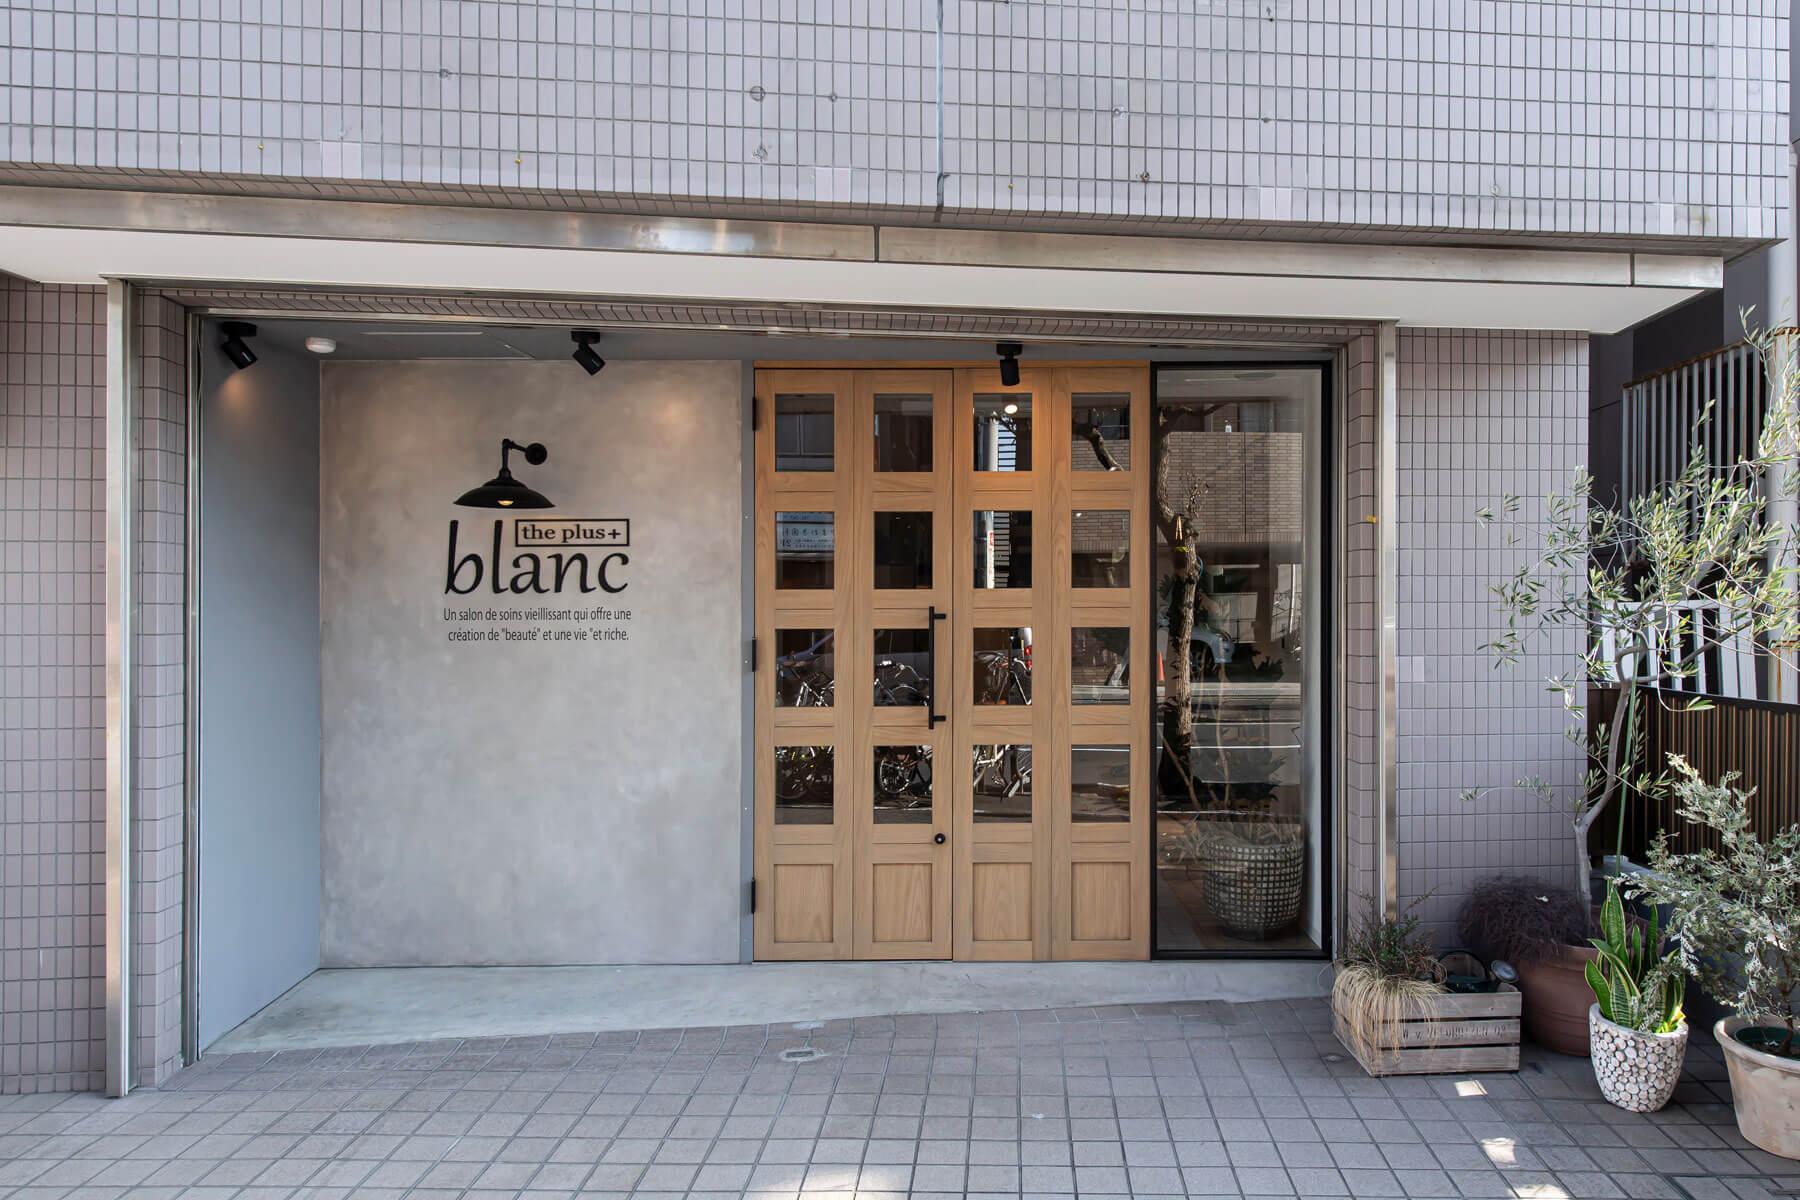 blanc the plus/Chiba